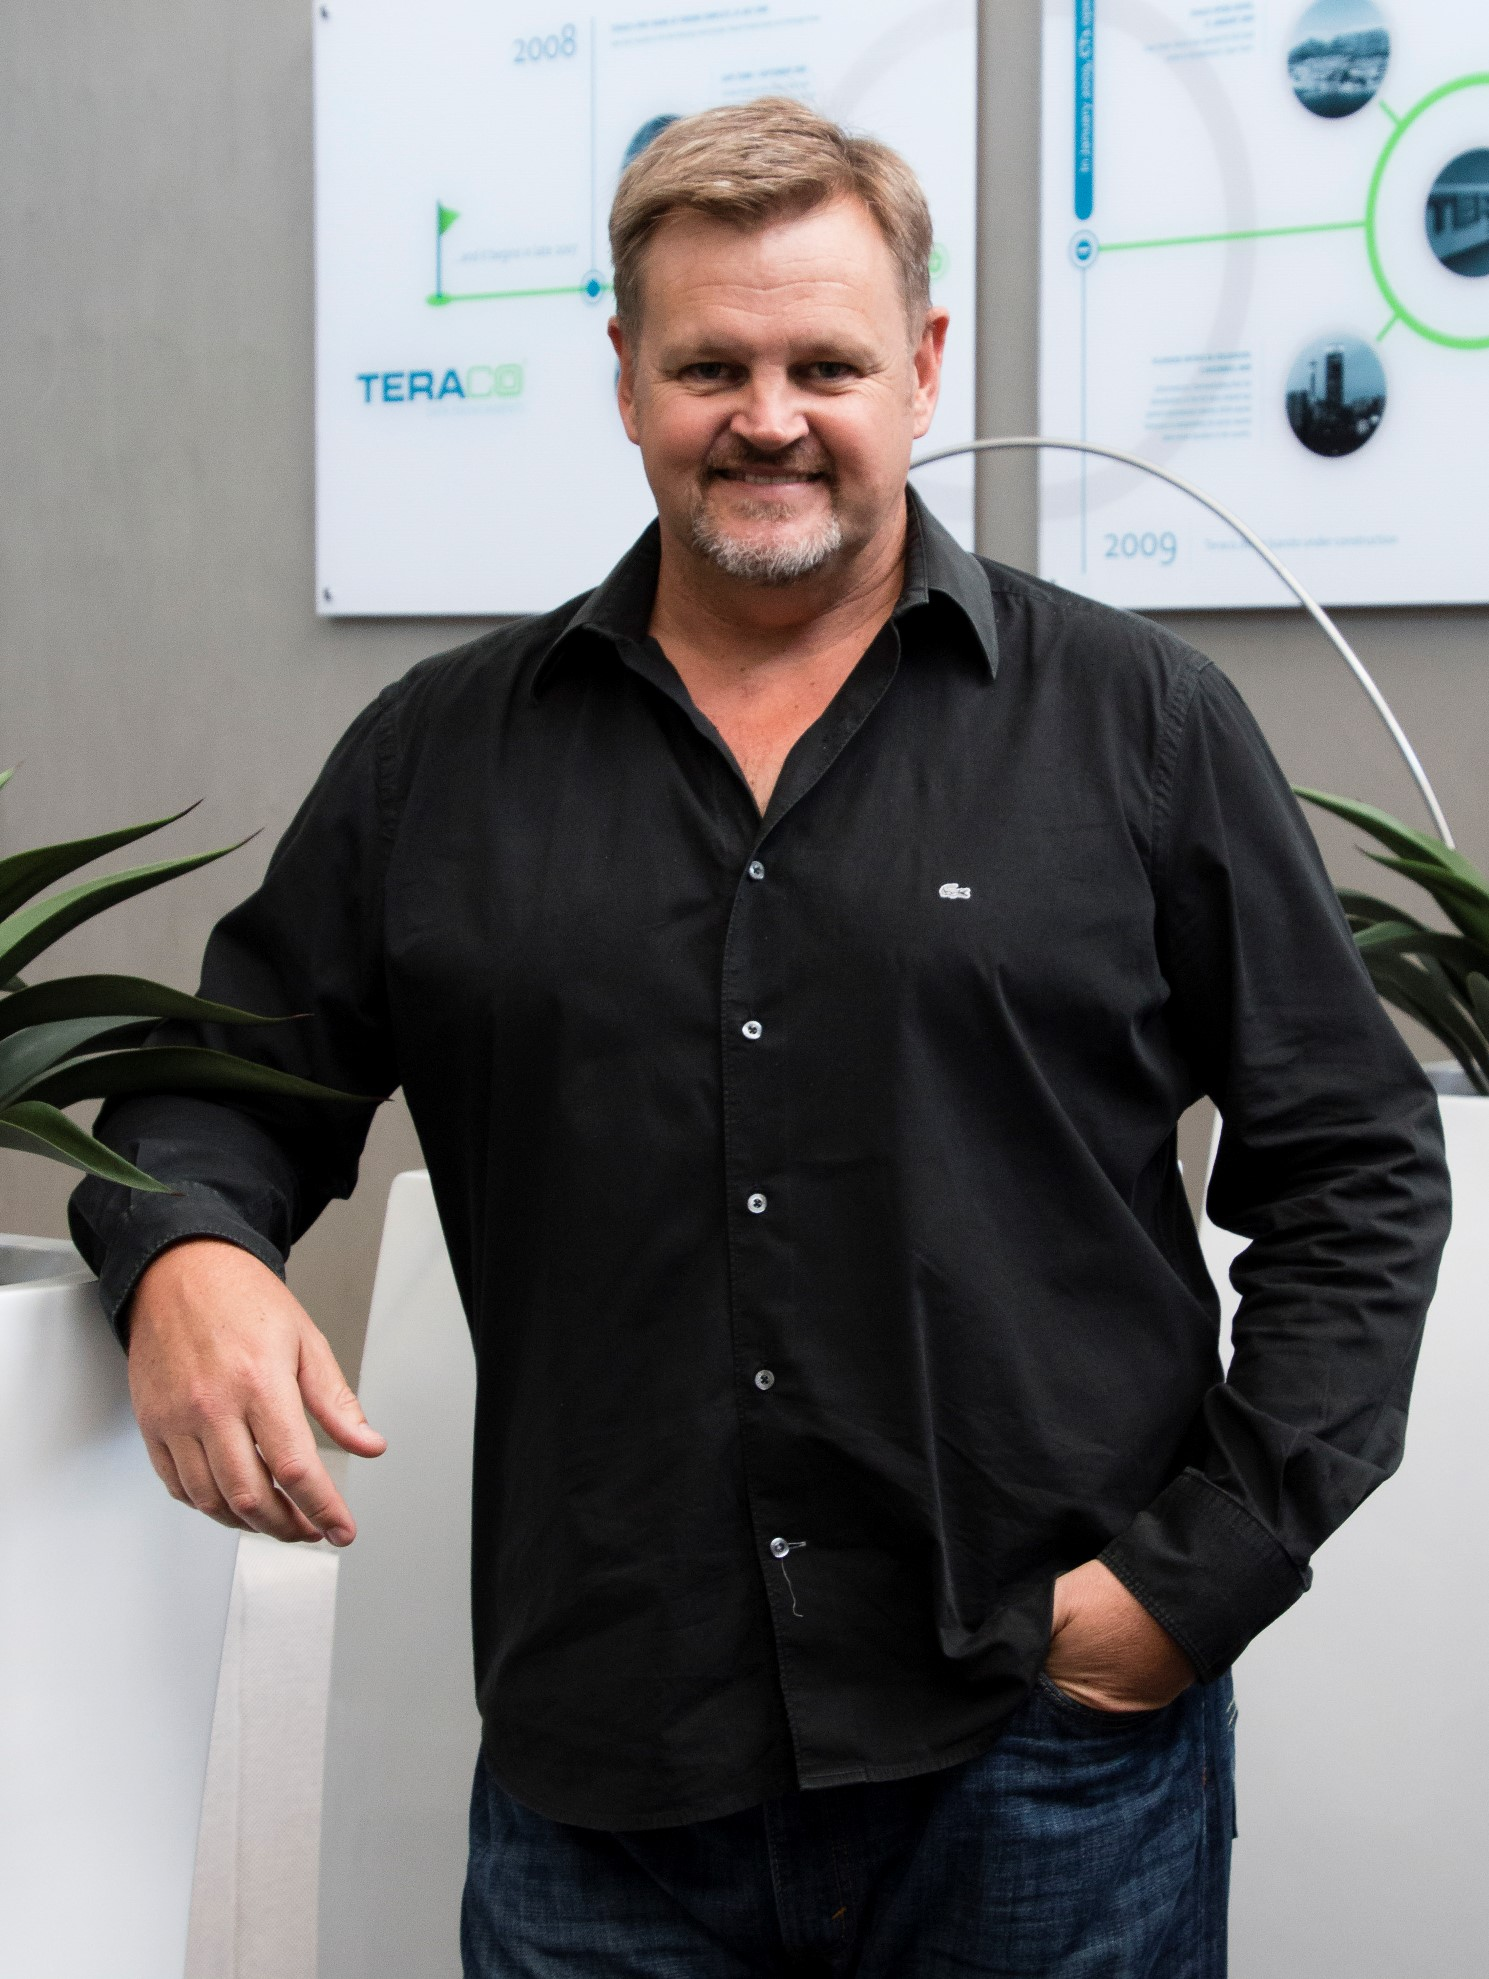 Image: Lex van Wyk, CEO, Teraco